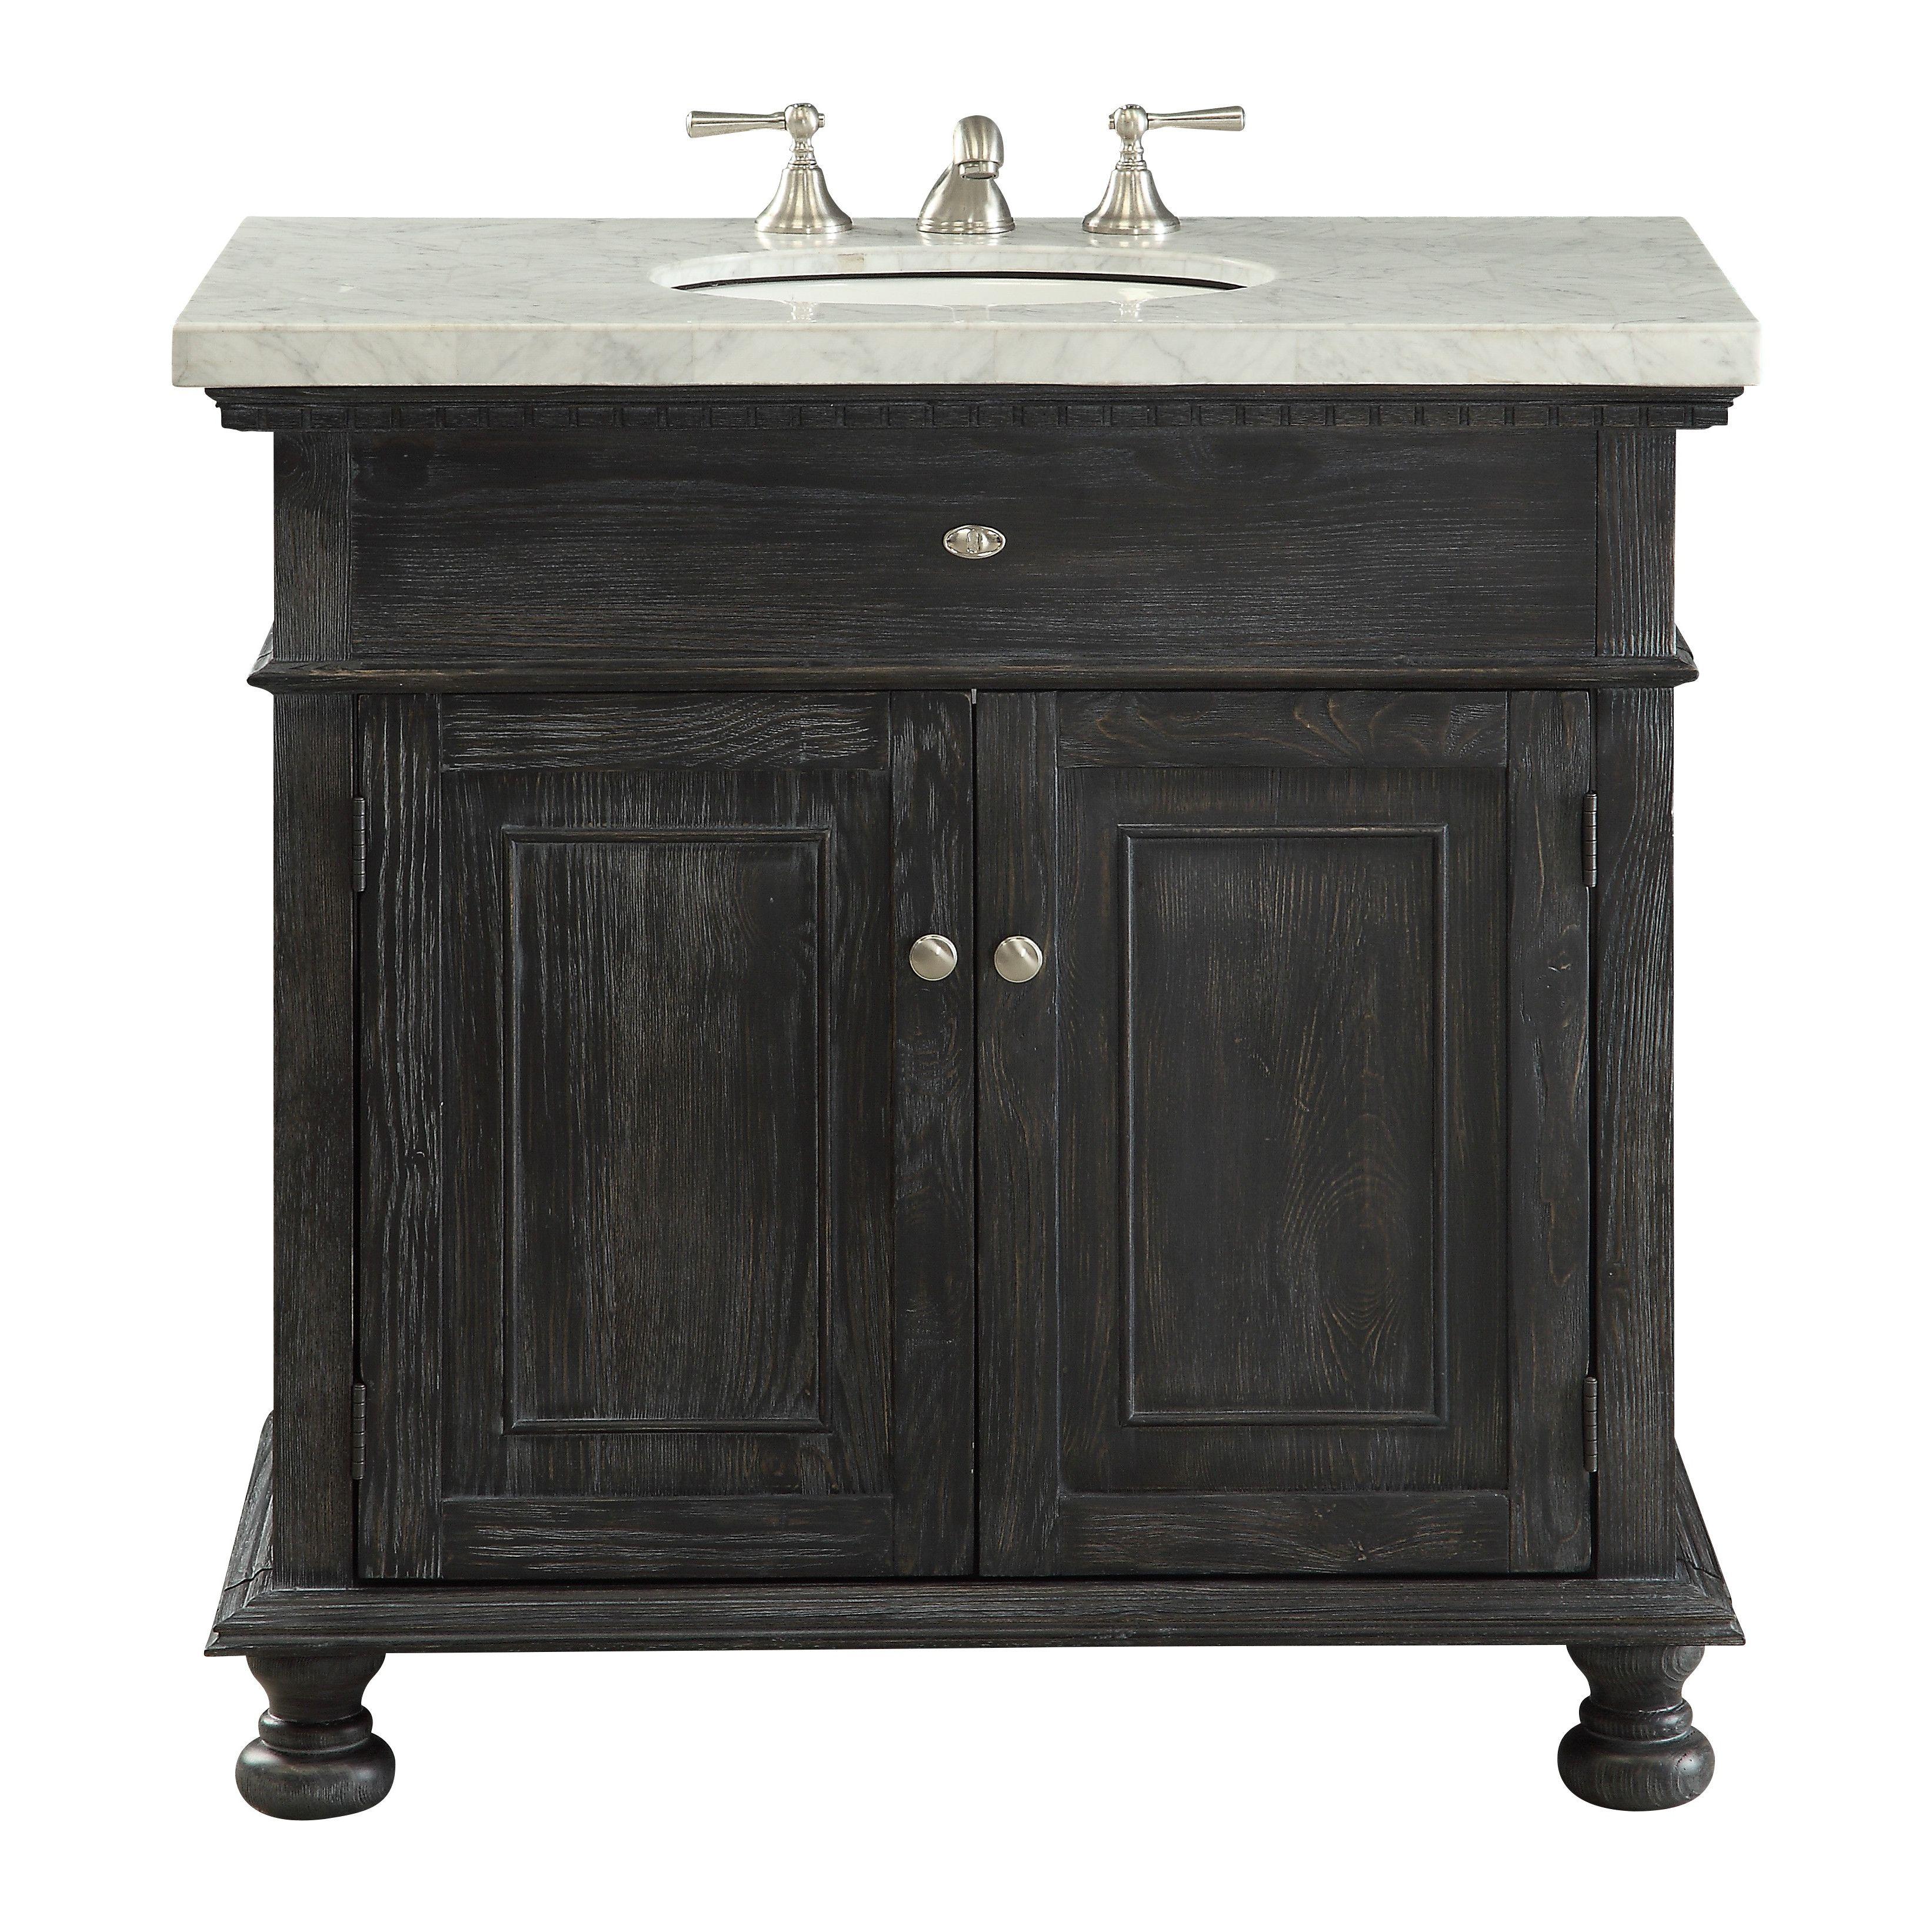 "Modena 24"" Single Bathroom Vanity Set Bathroom, Vanity"